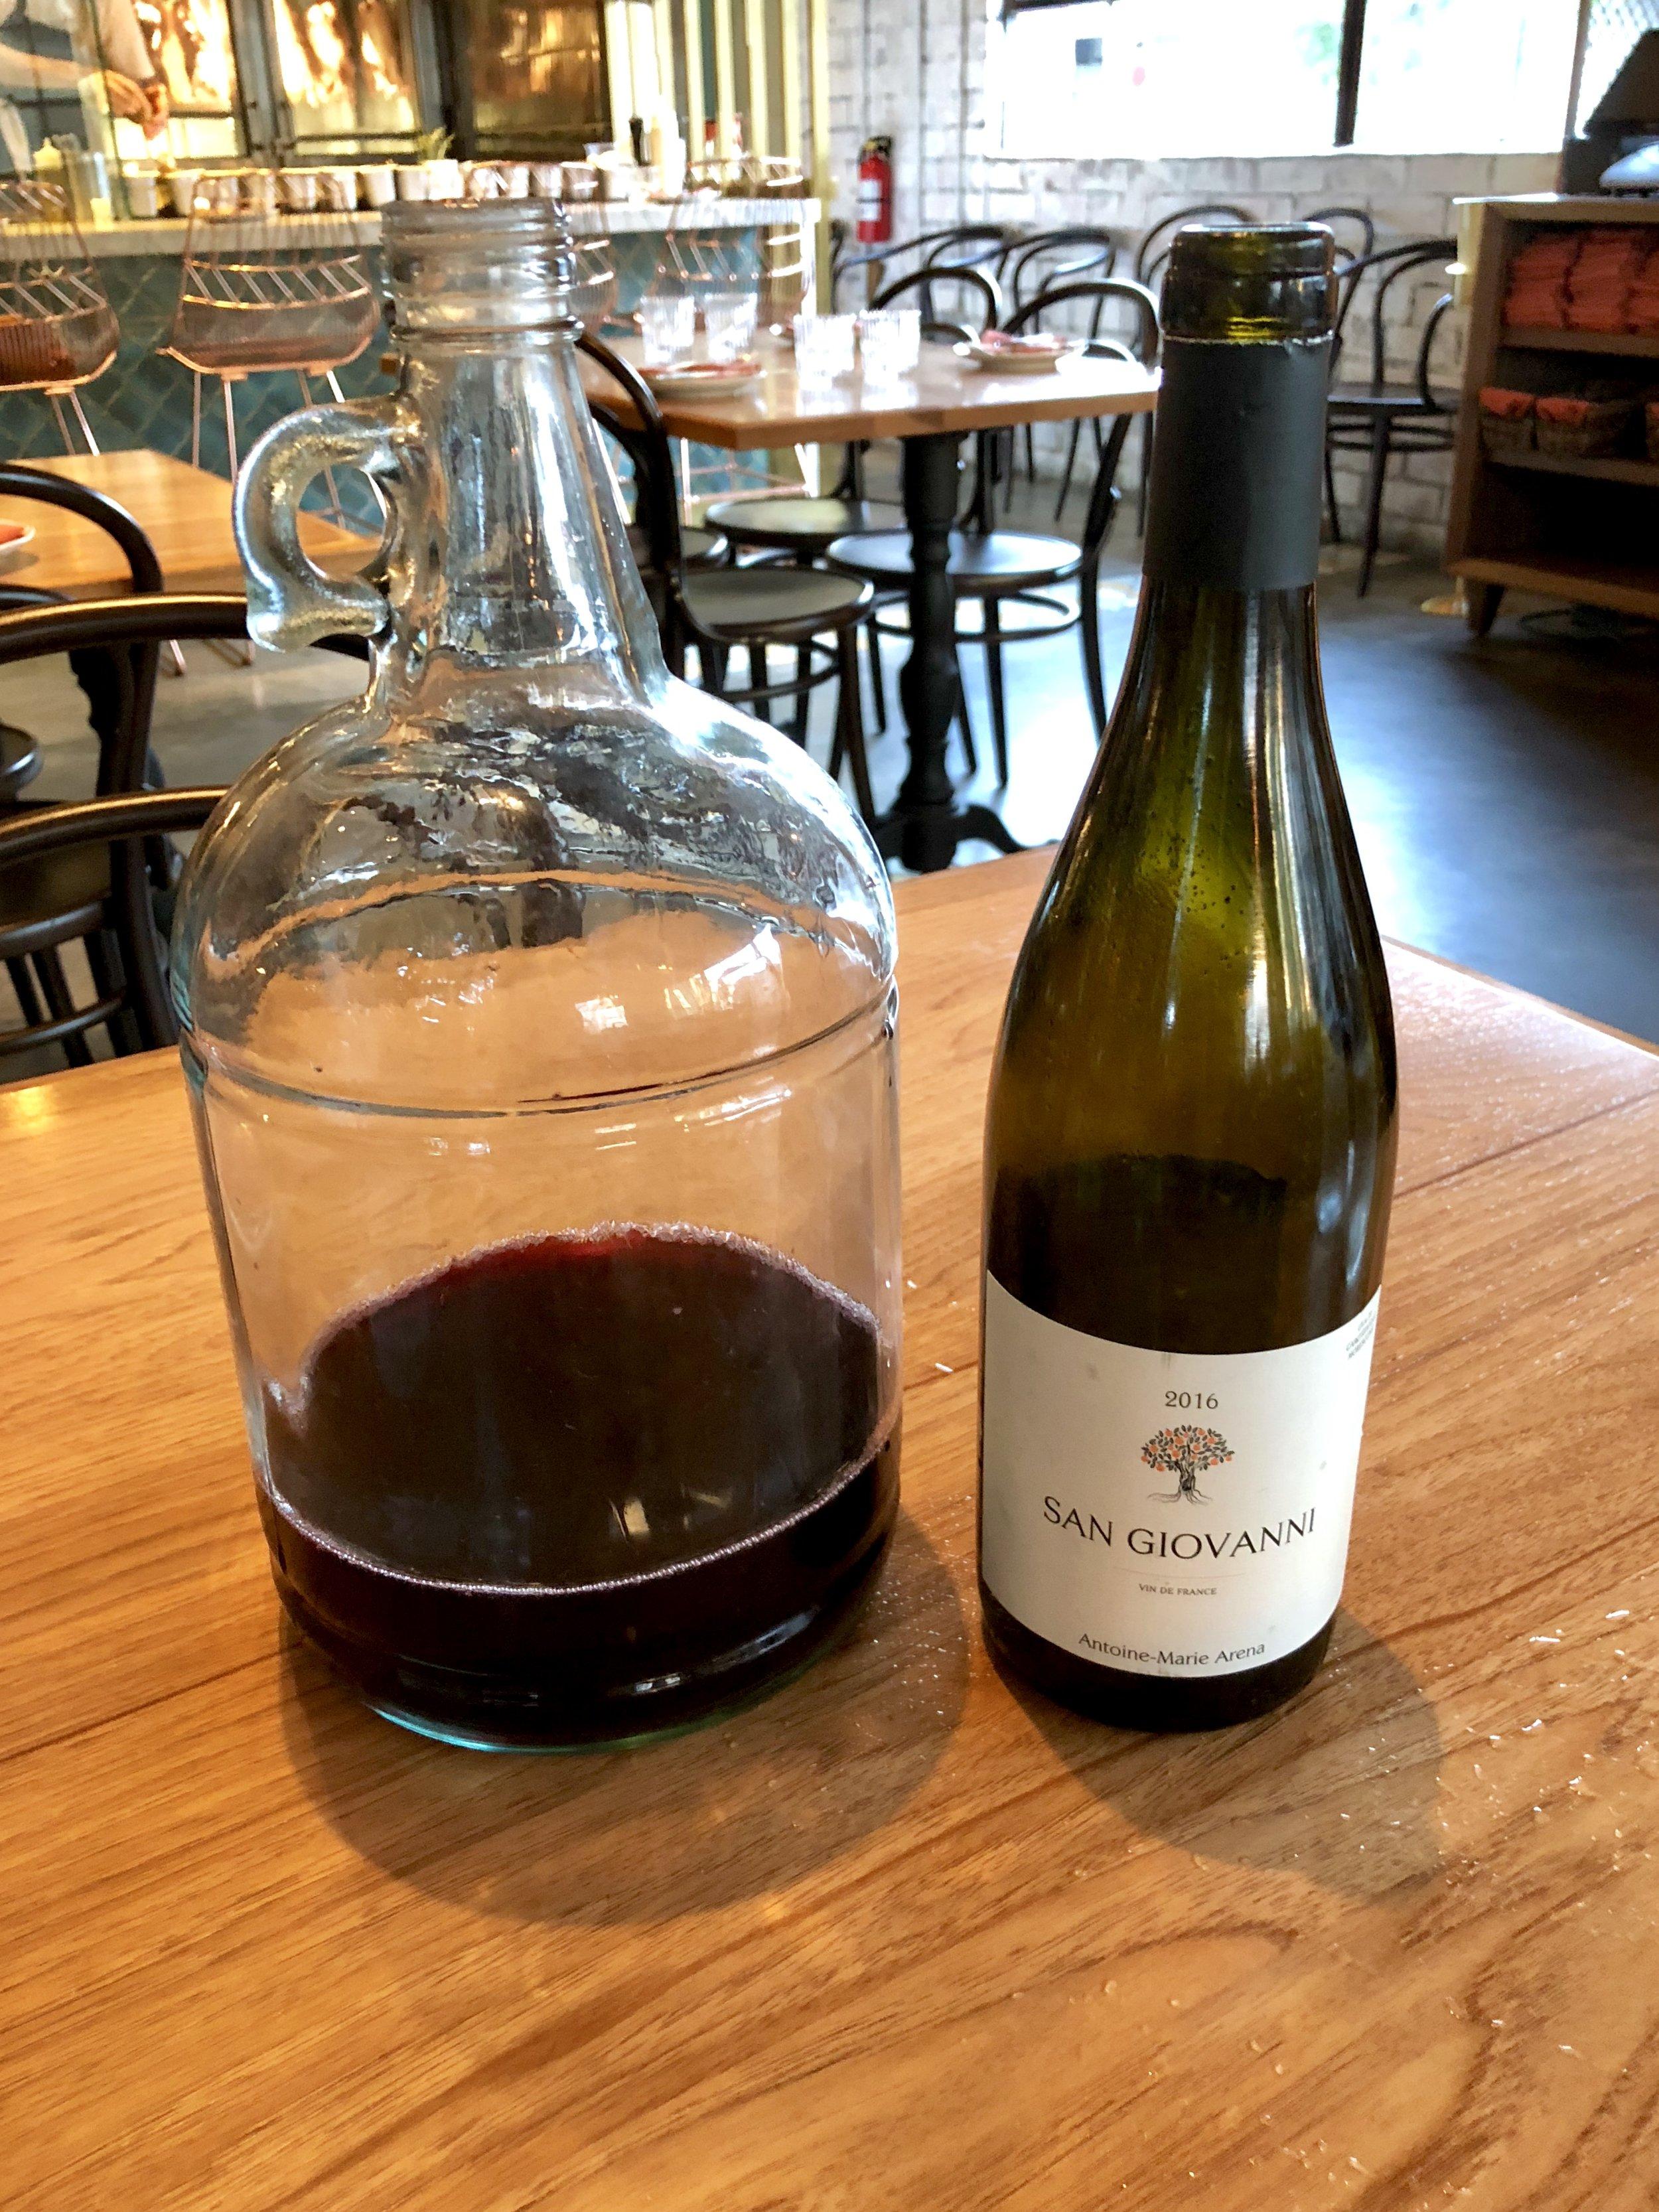 2016 antoine-marie arena vin de france san giovanni